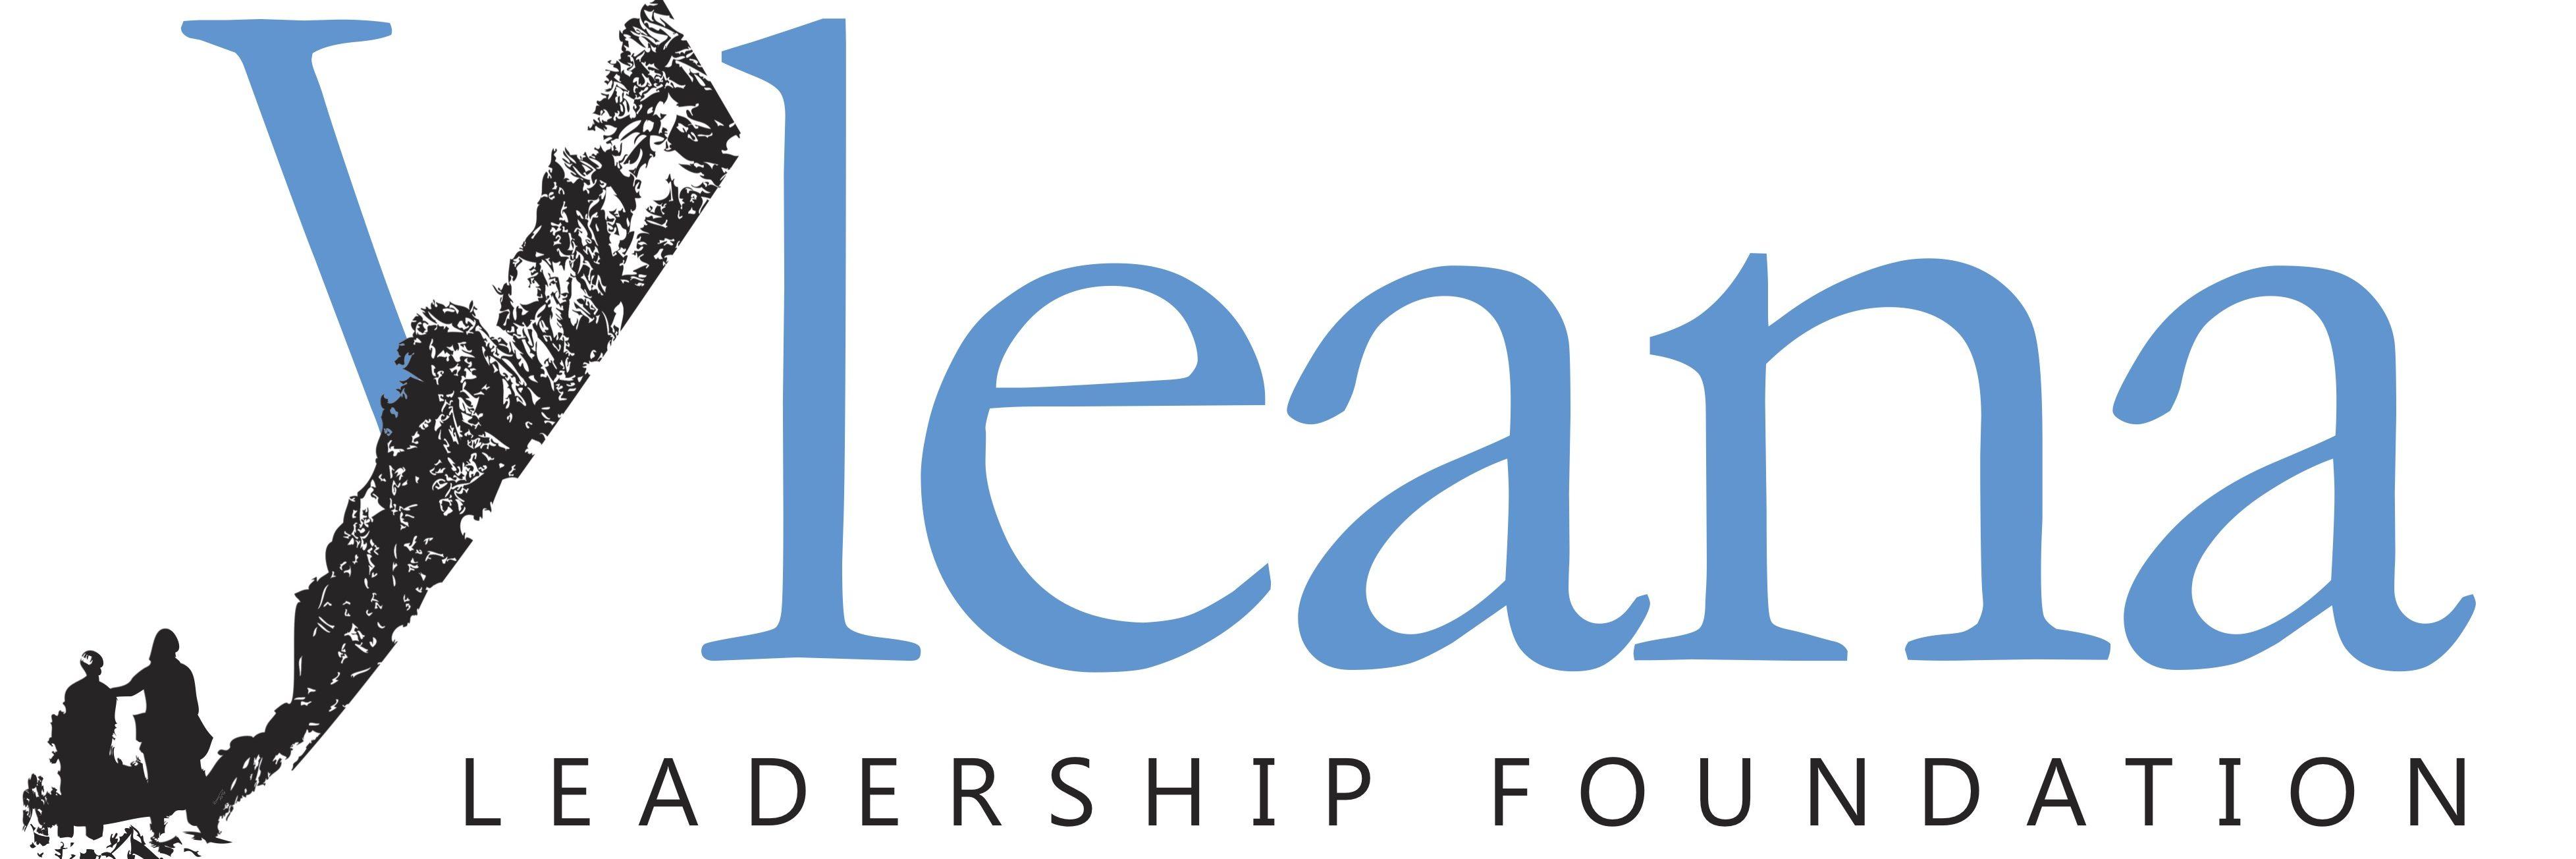 Yleana Leadership Academy